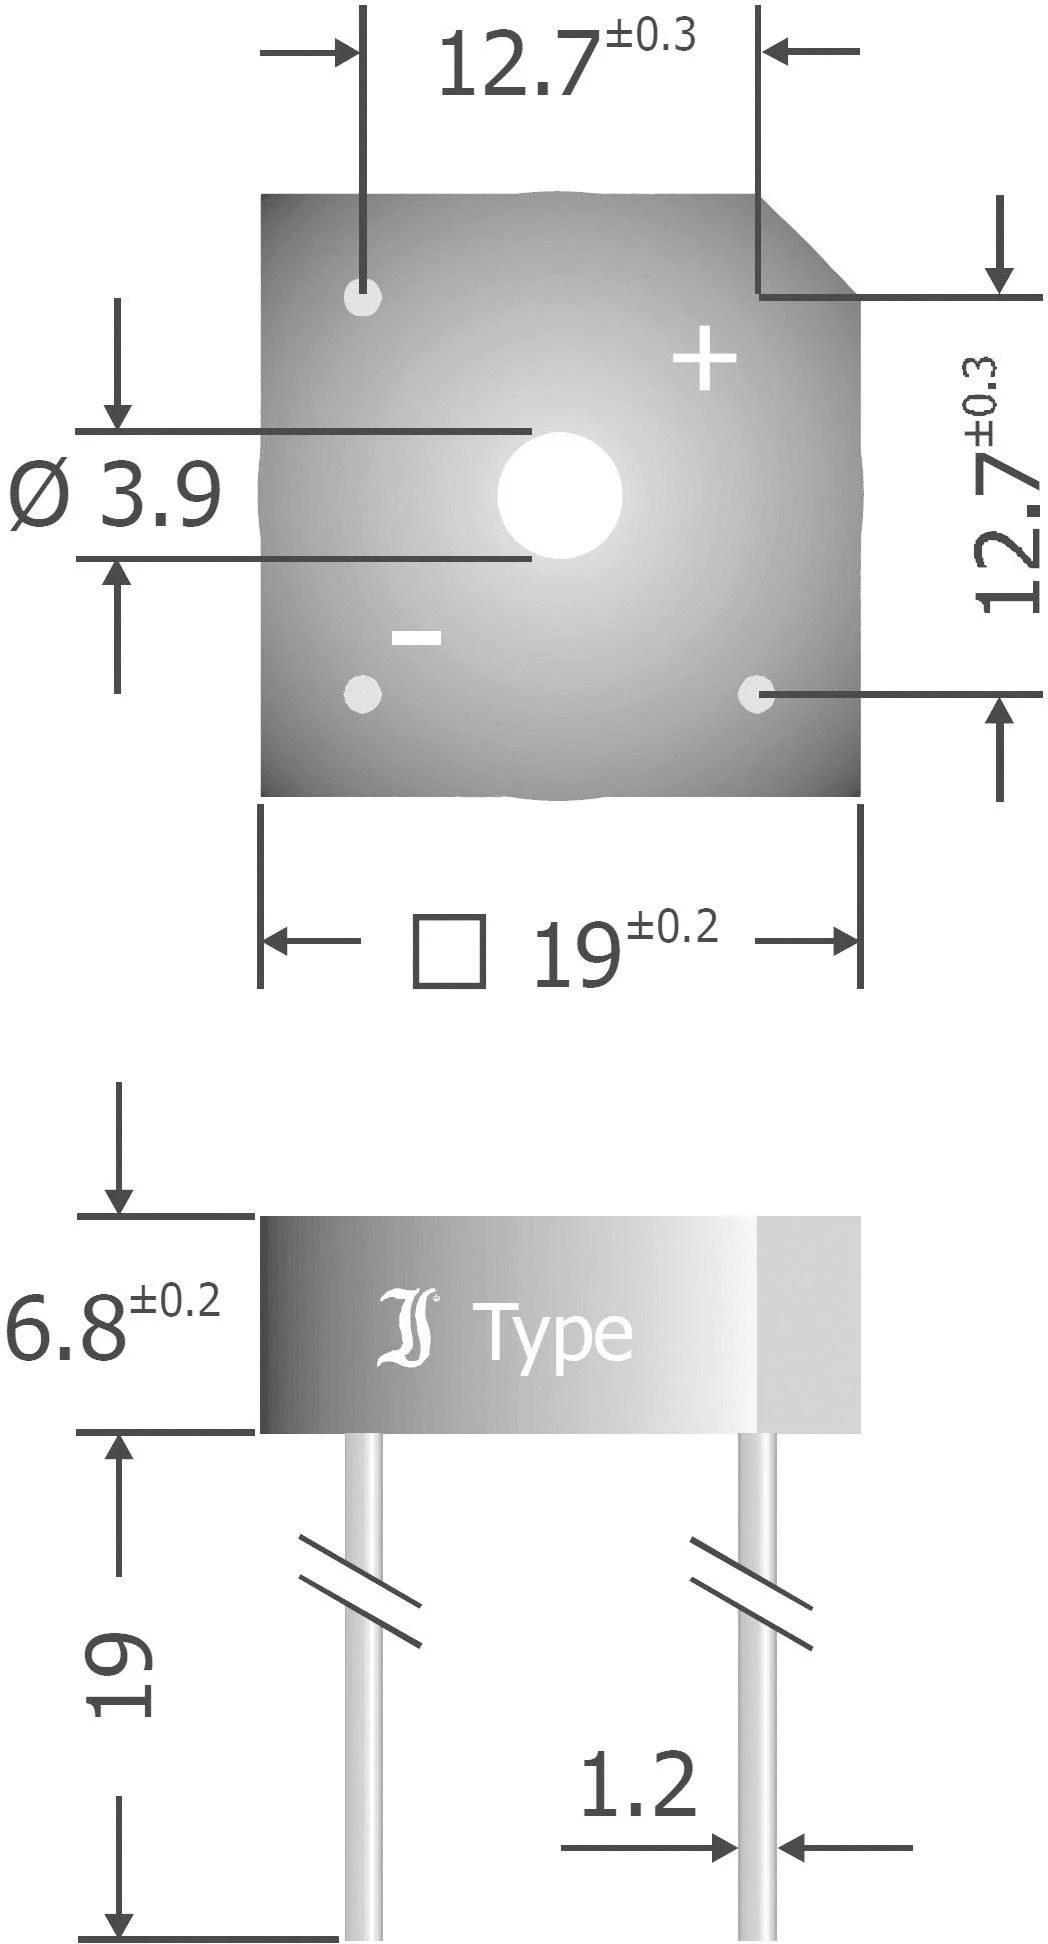 diotec kbpc808 diode bridge kbpc 800 v 8 a 1 phase [ 1000 x 1000 Pixel ]